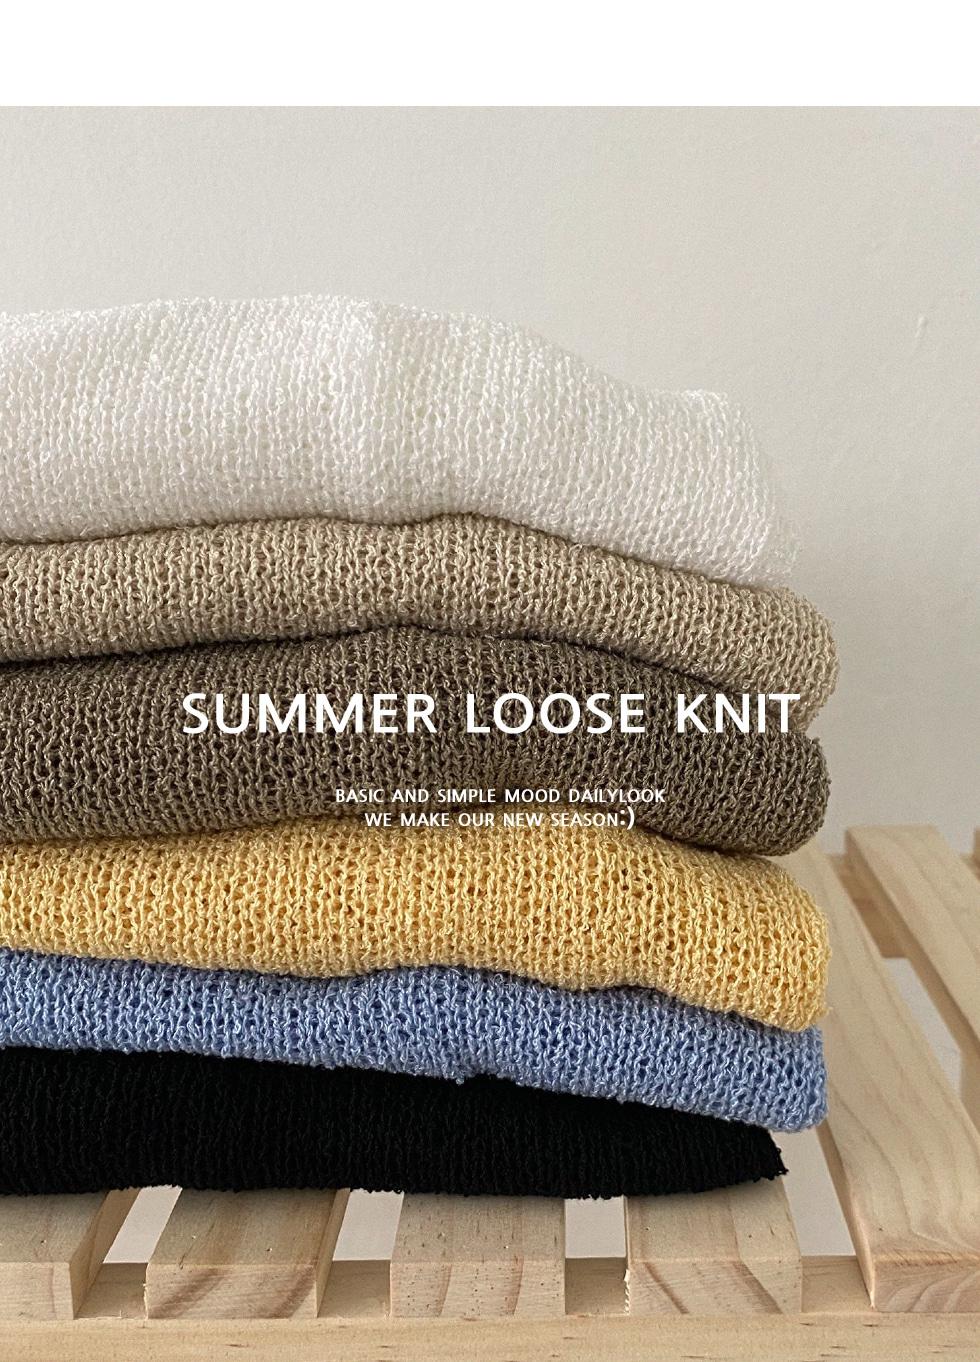 Lana Summer Rouge Knit